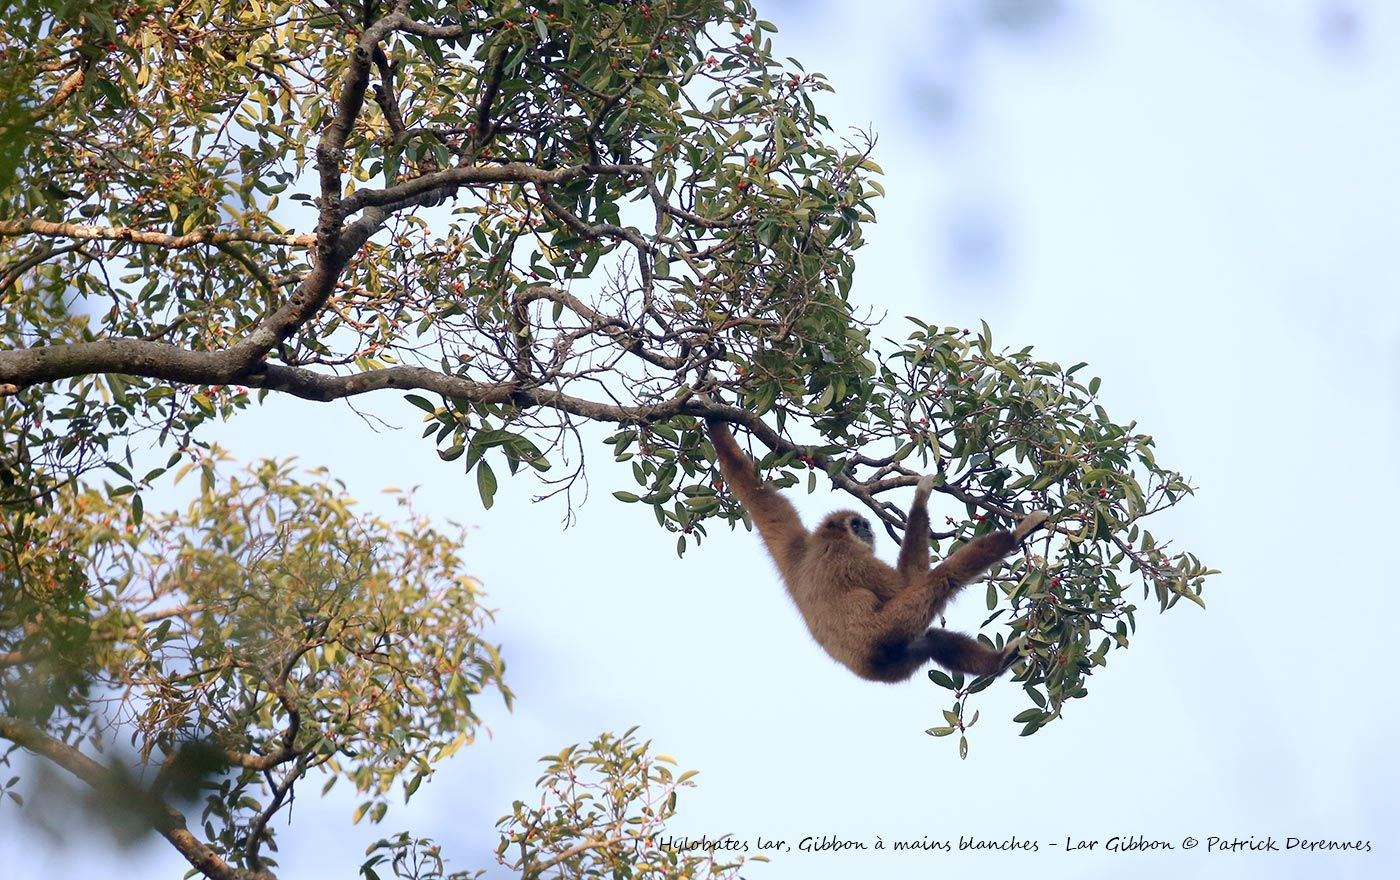 Thaïlande 2014 - Gibbon à mains blanches